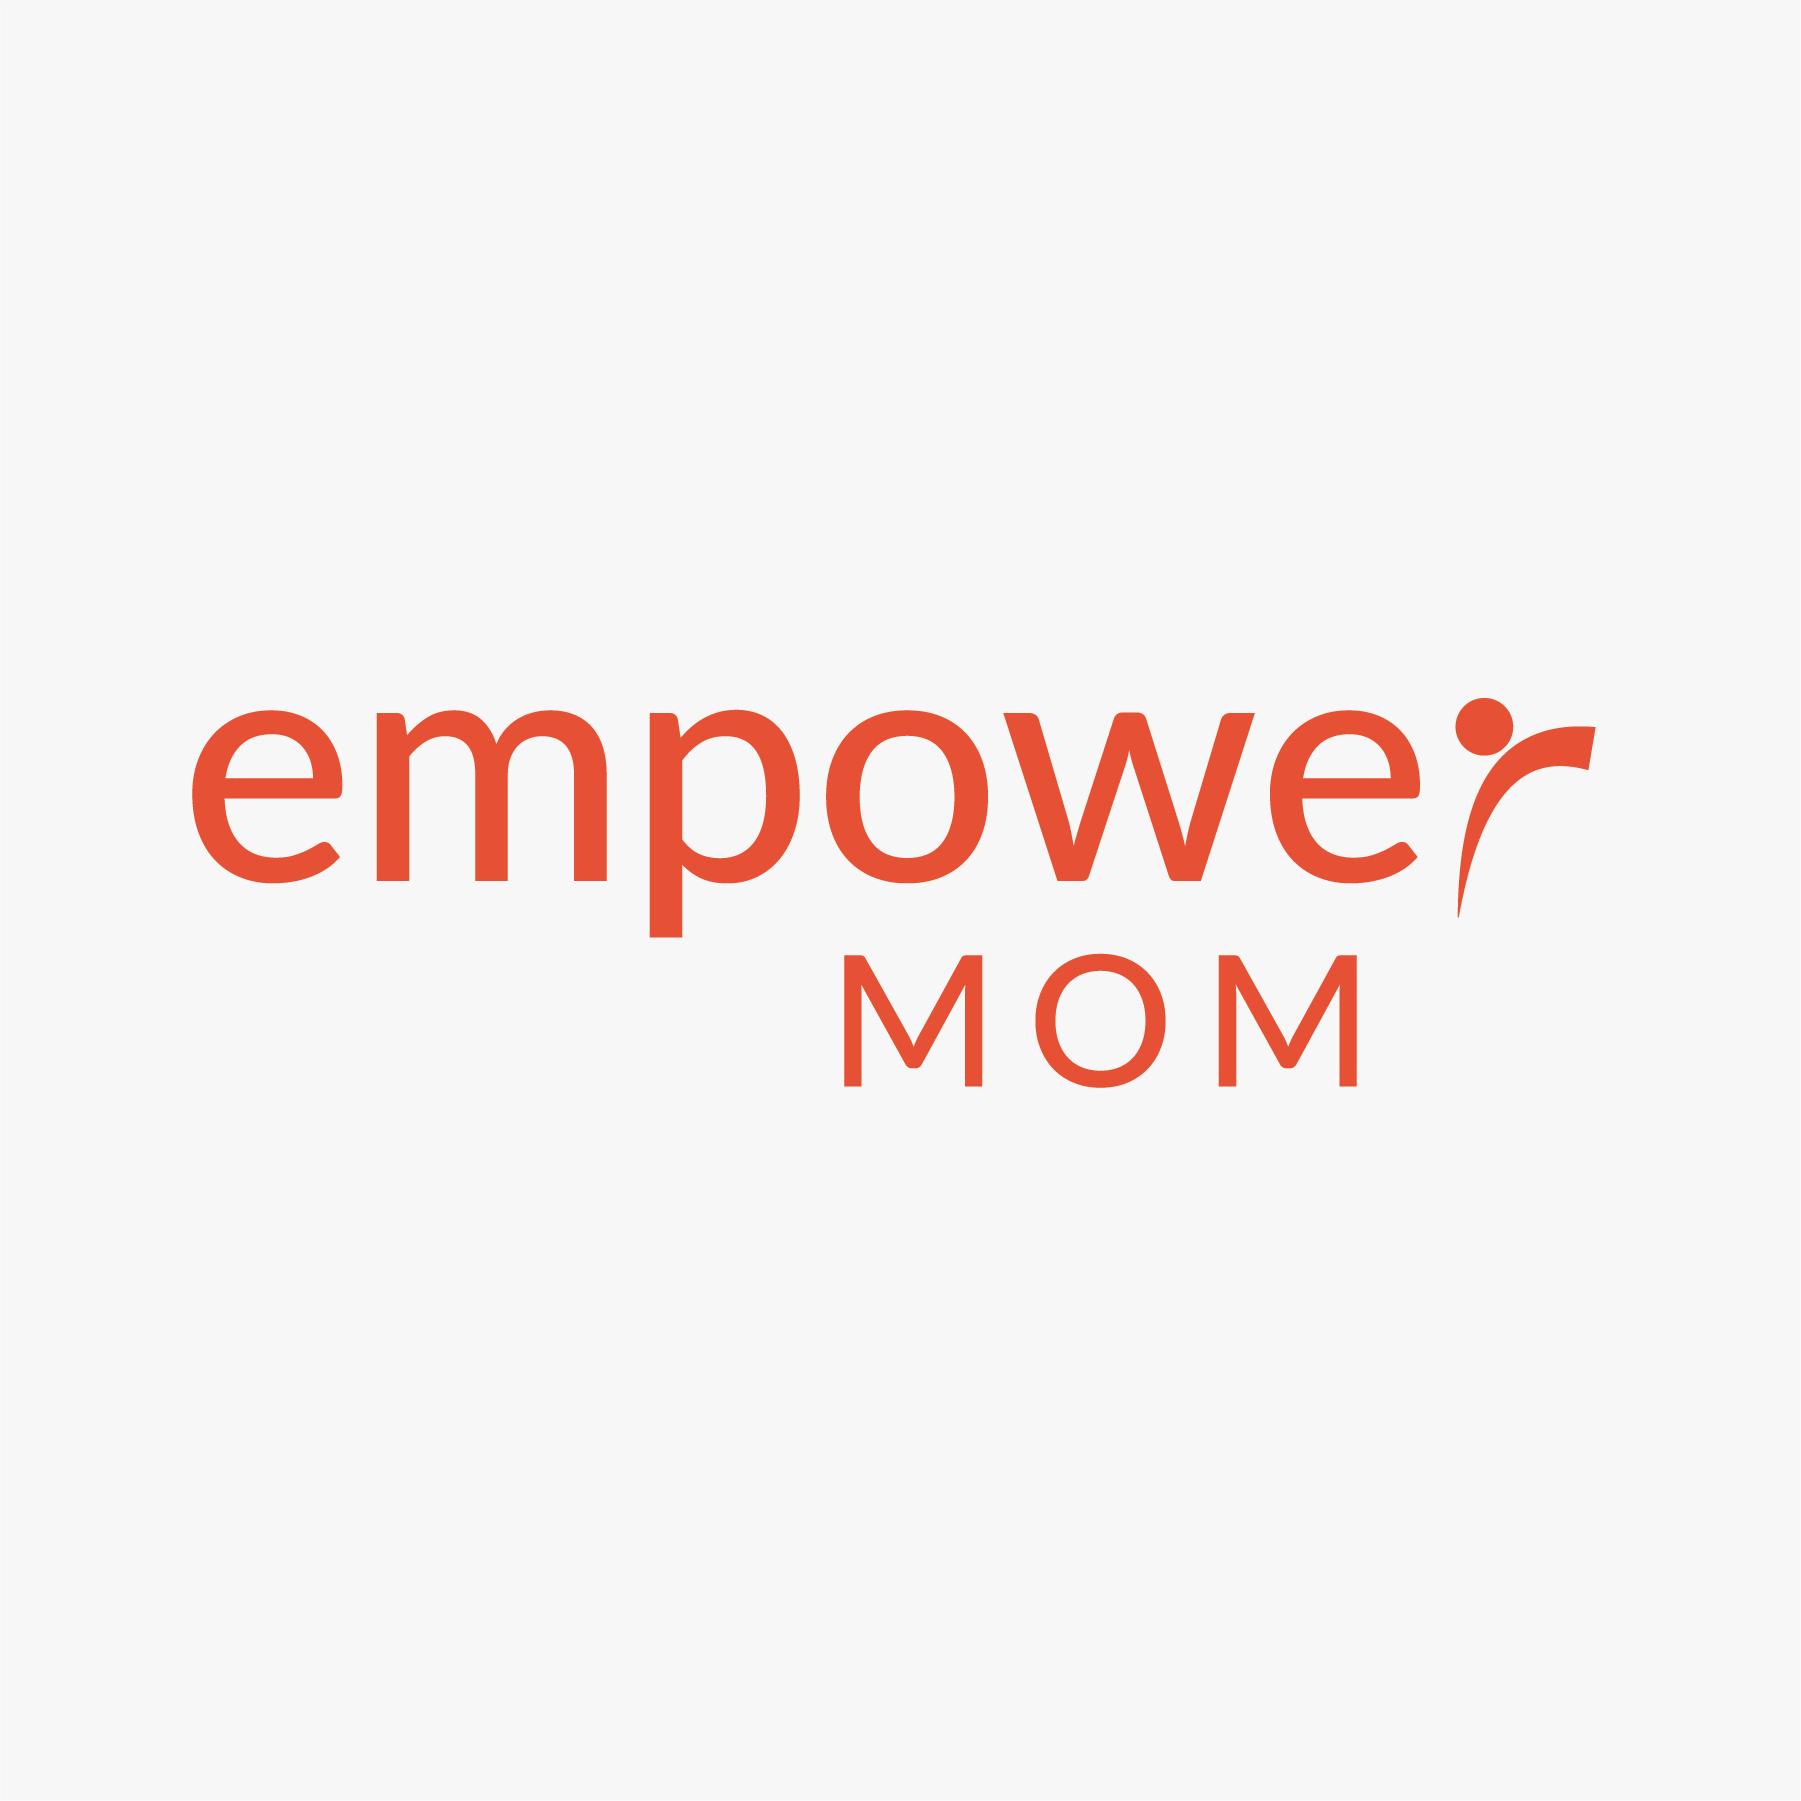 LCCM Empower Mom.jpg